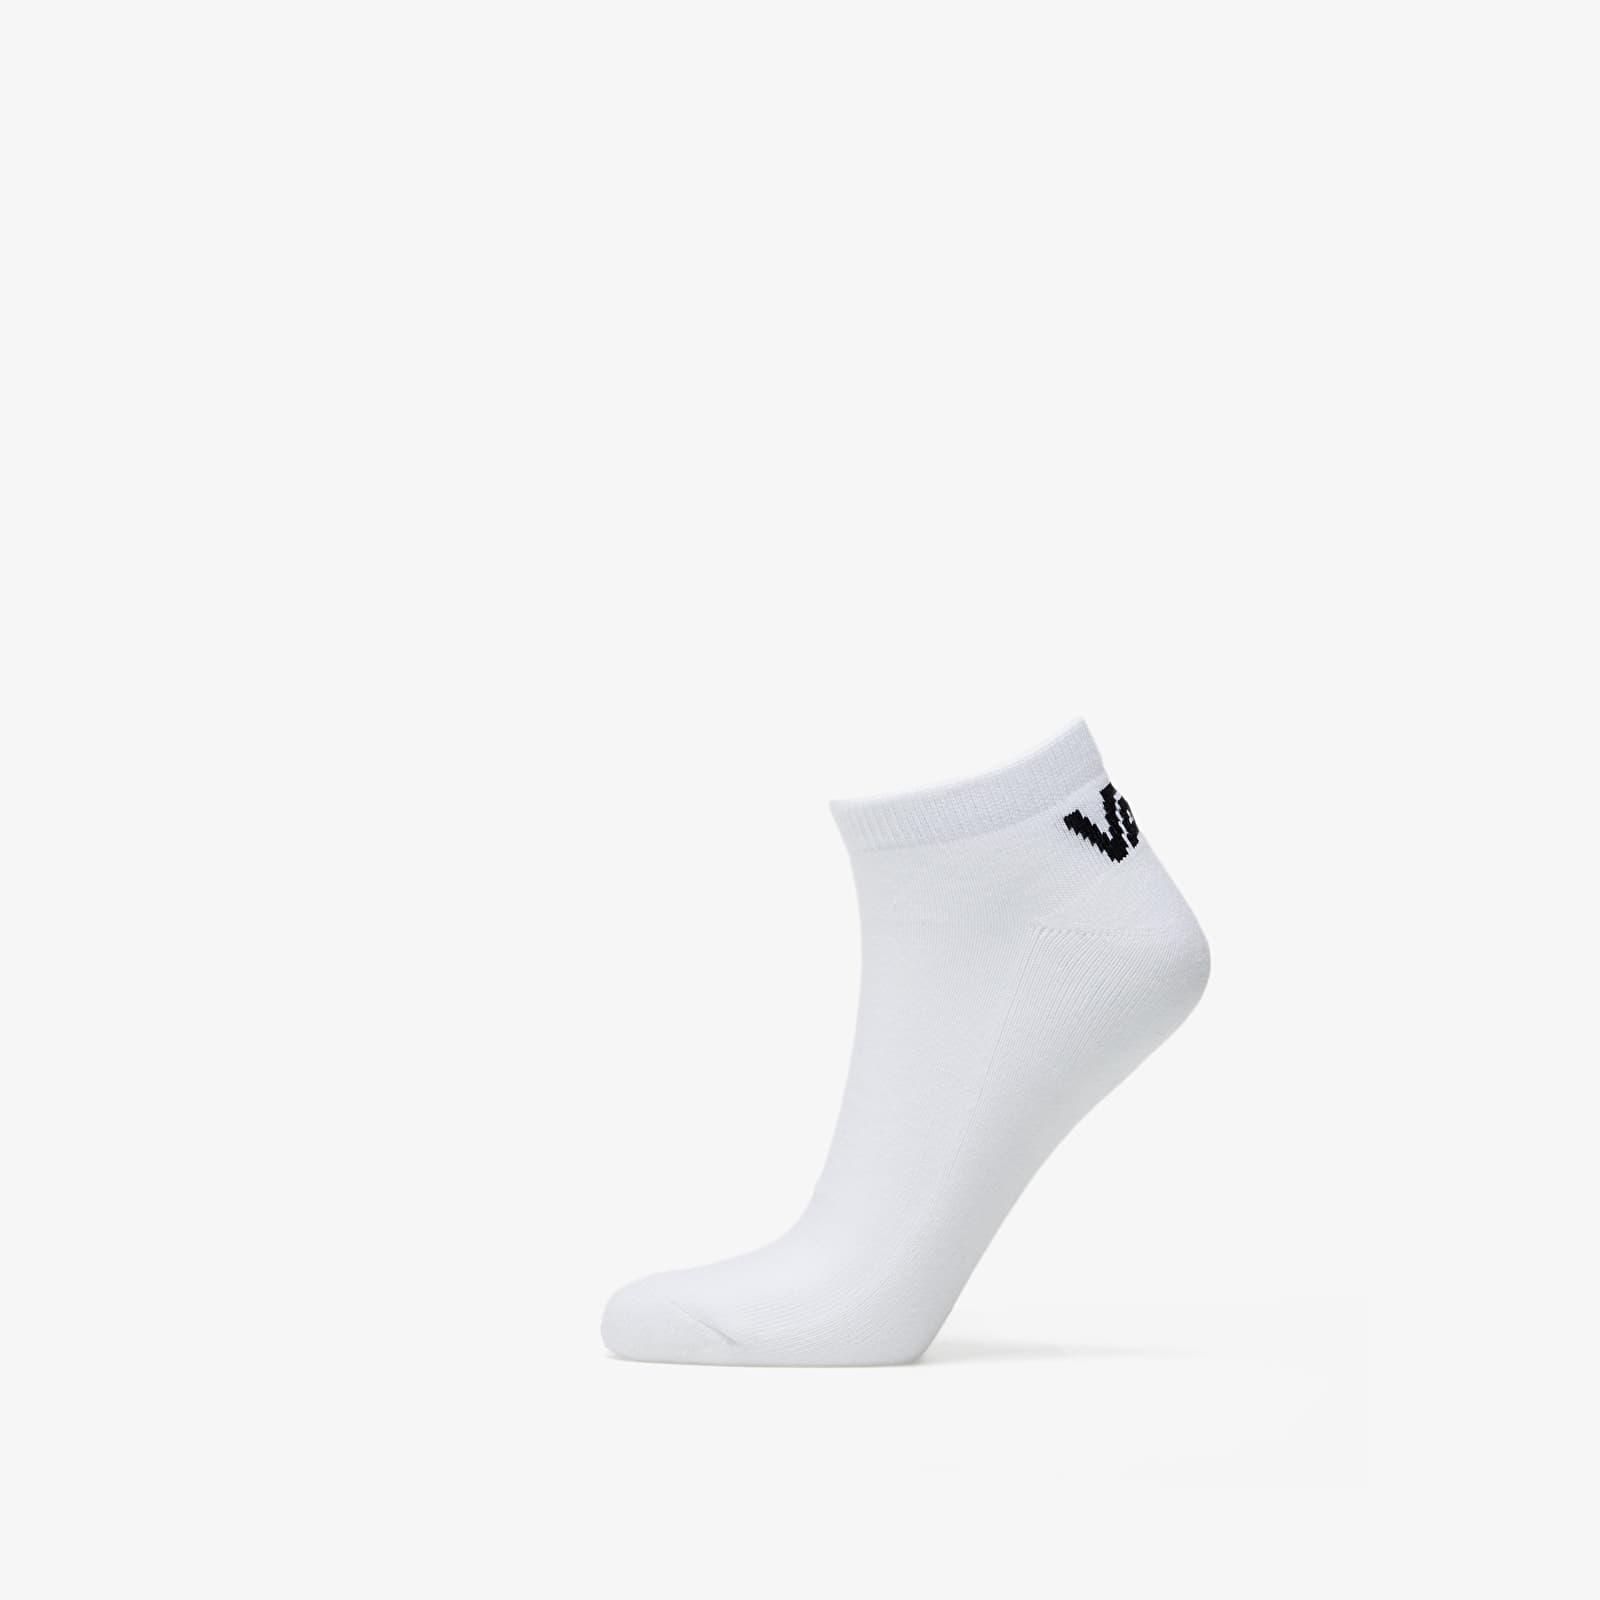 Vans Classic Low 3 Pair Socks White EUR 42.5-47